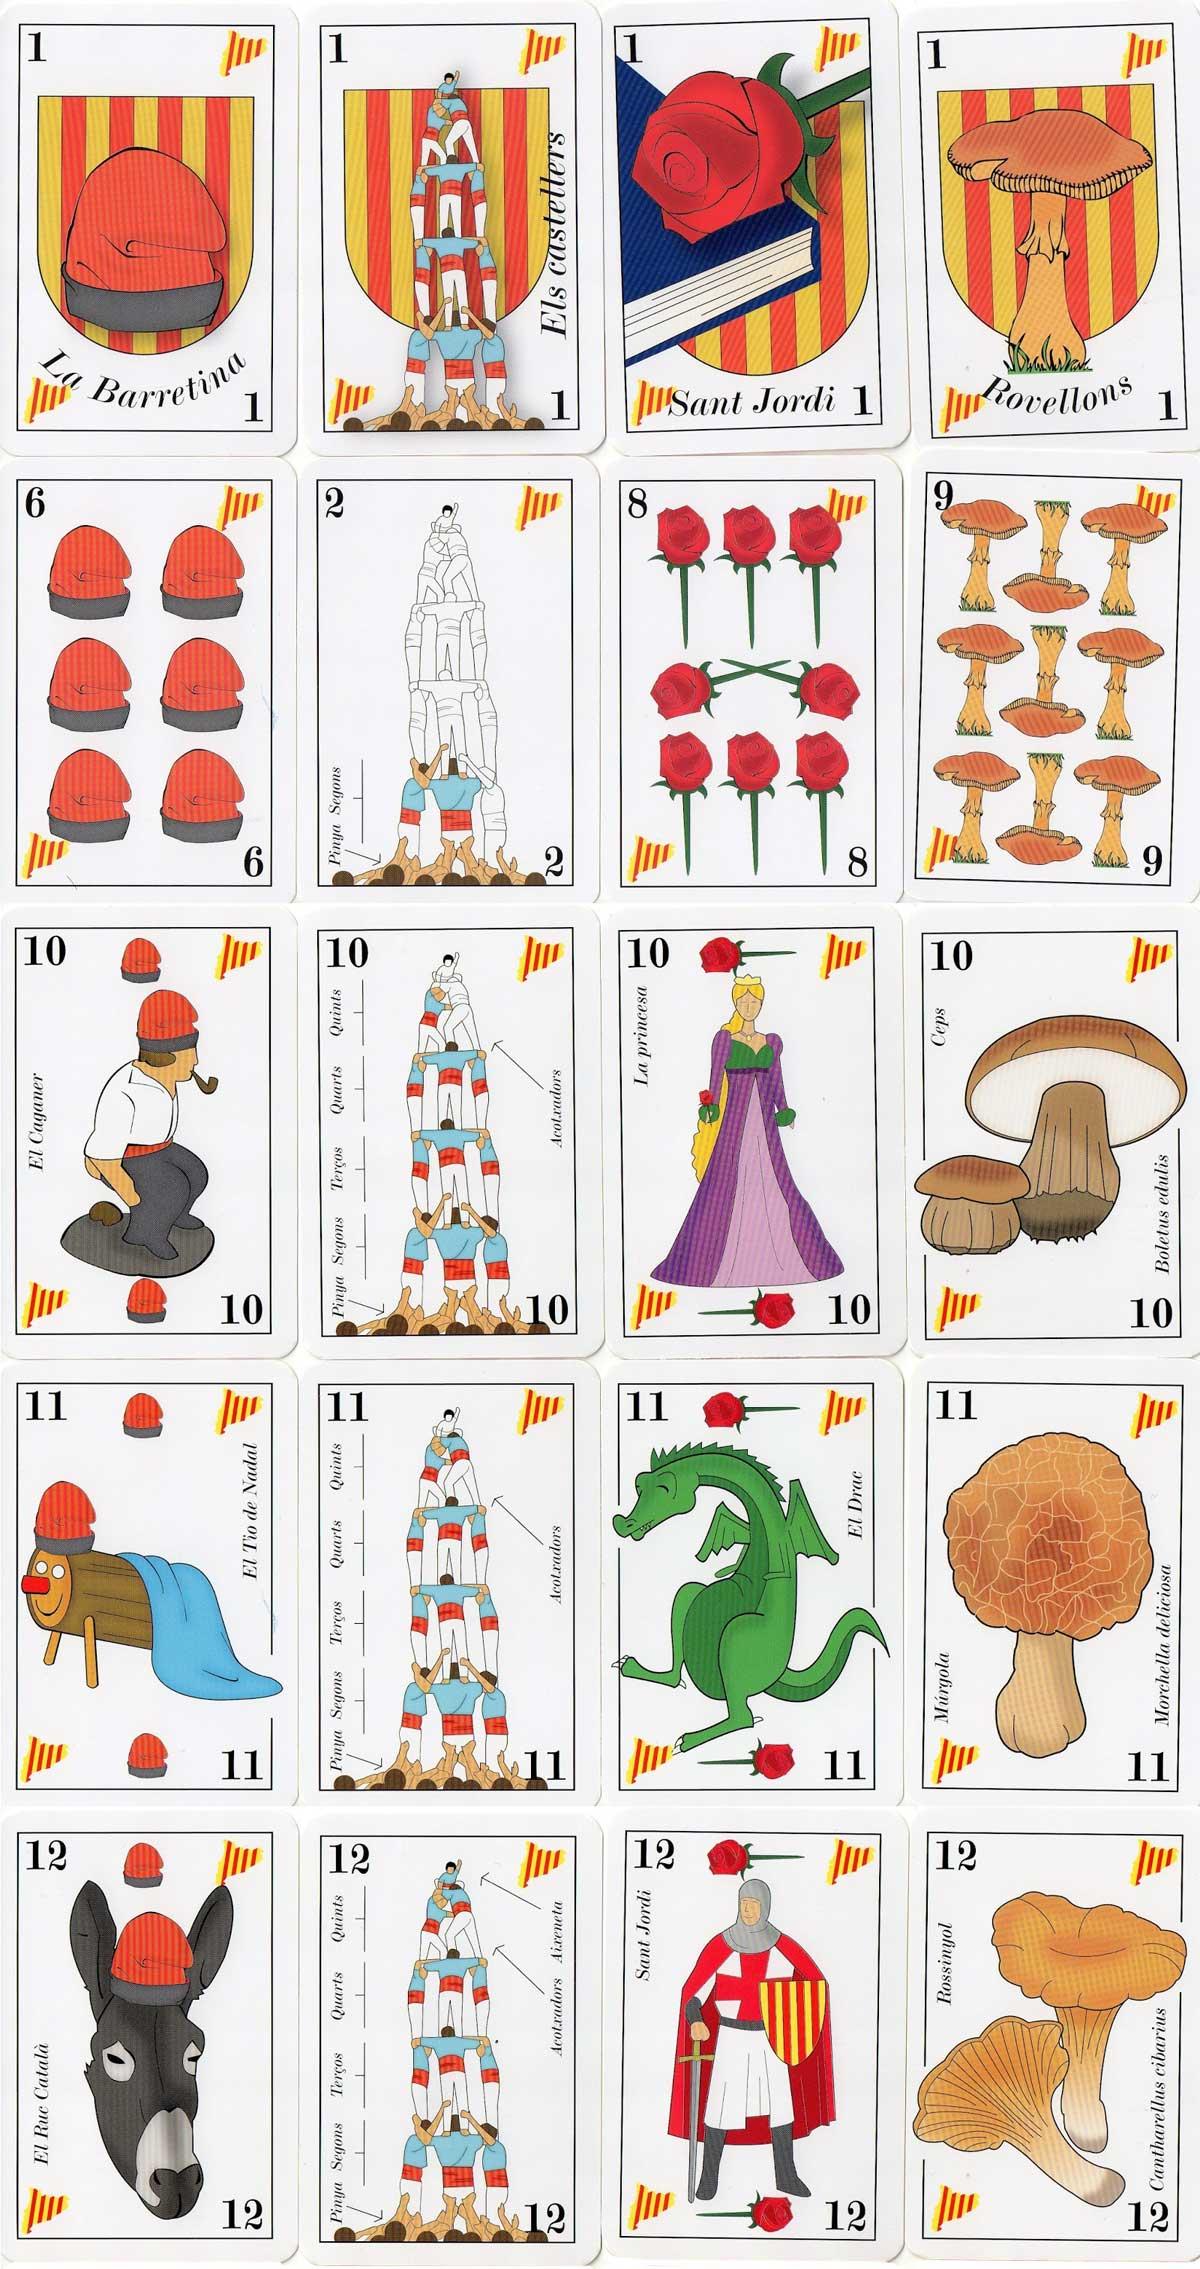 'Baraja Catalana' playing cards published by Varitemas